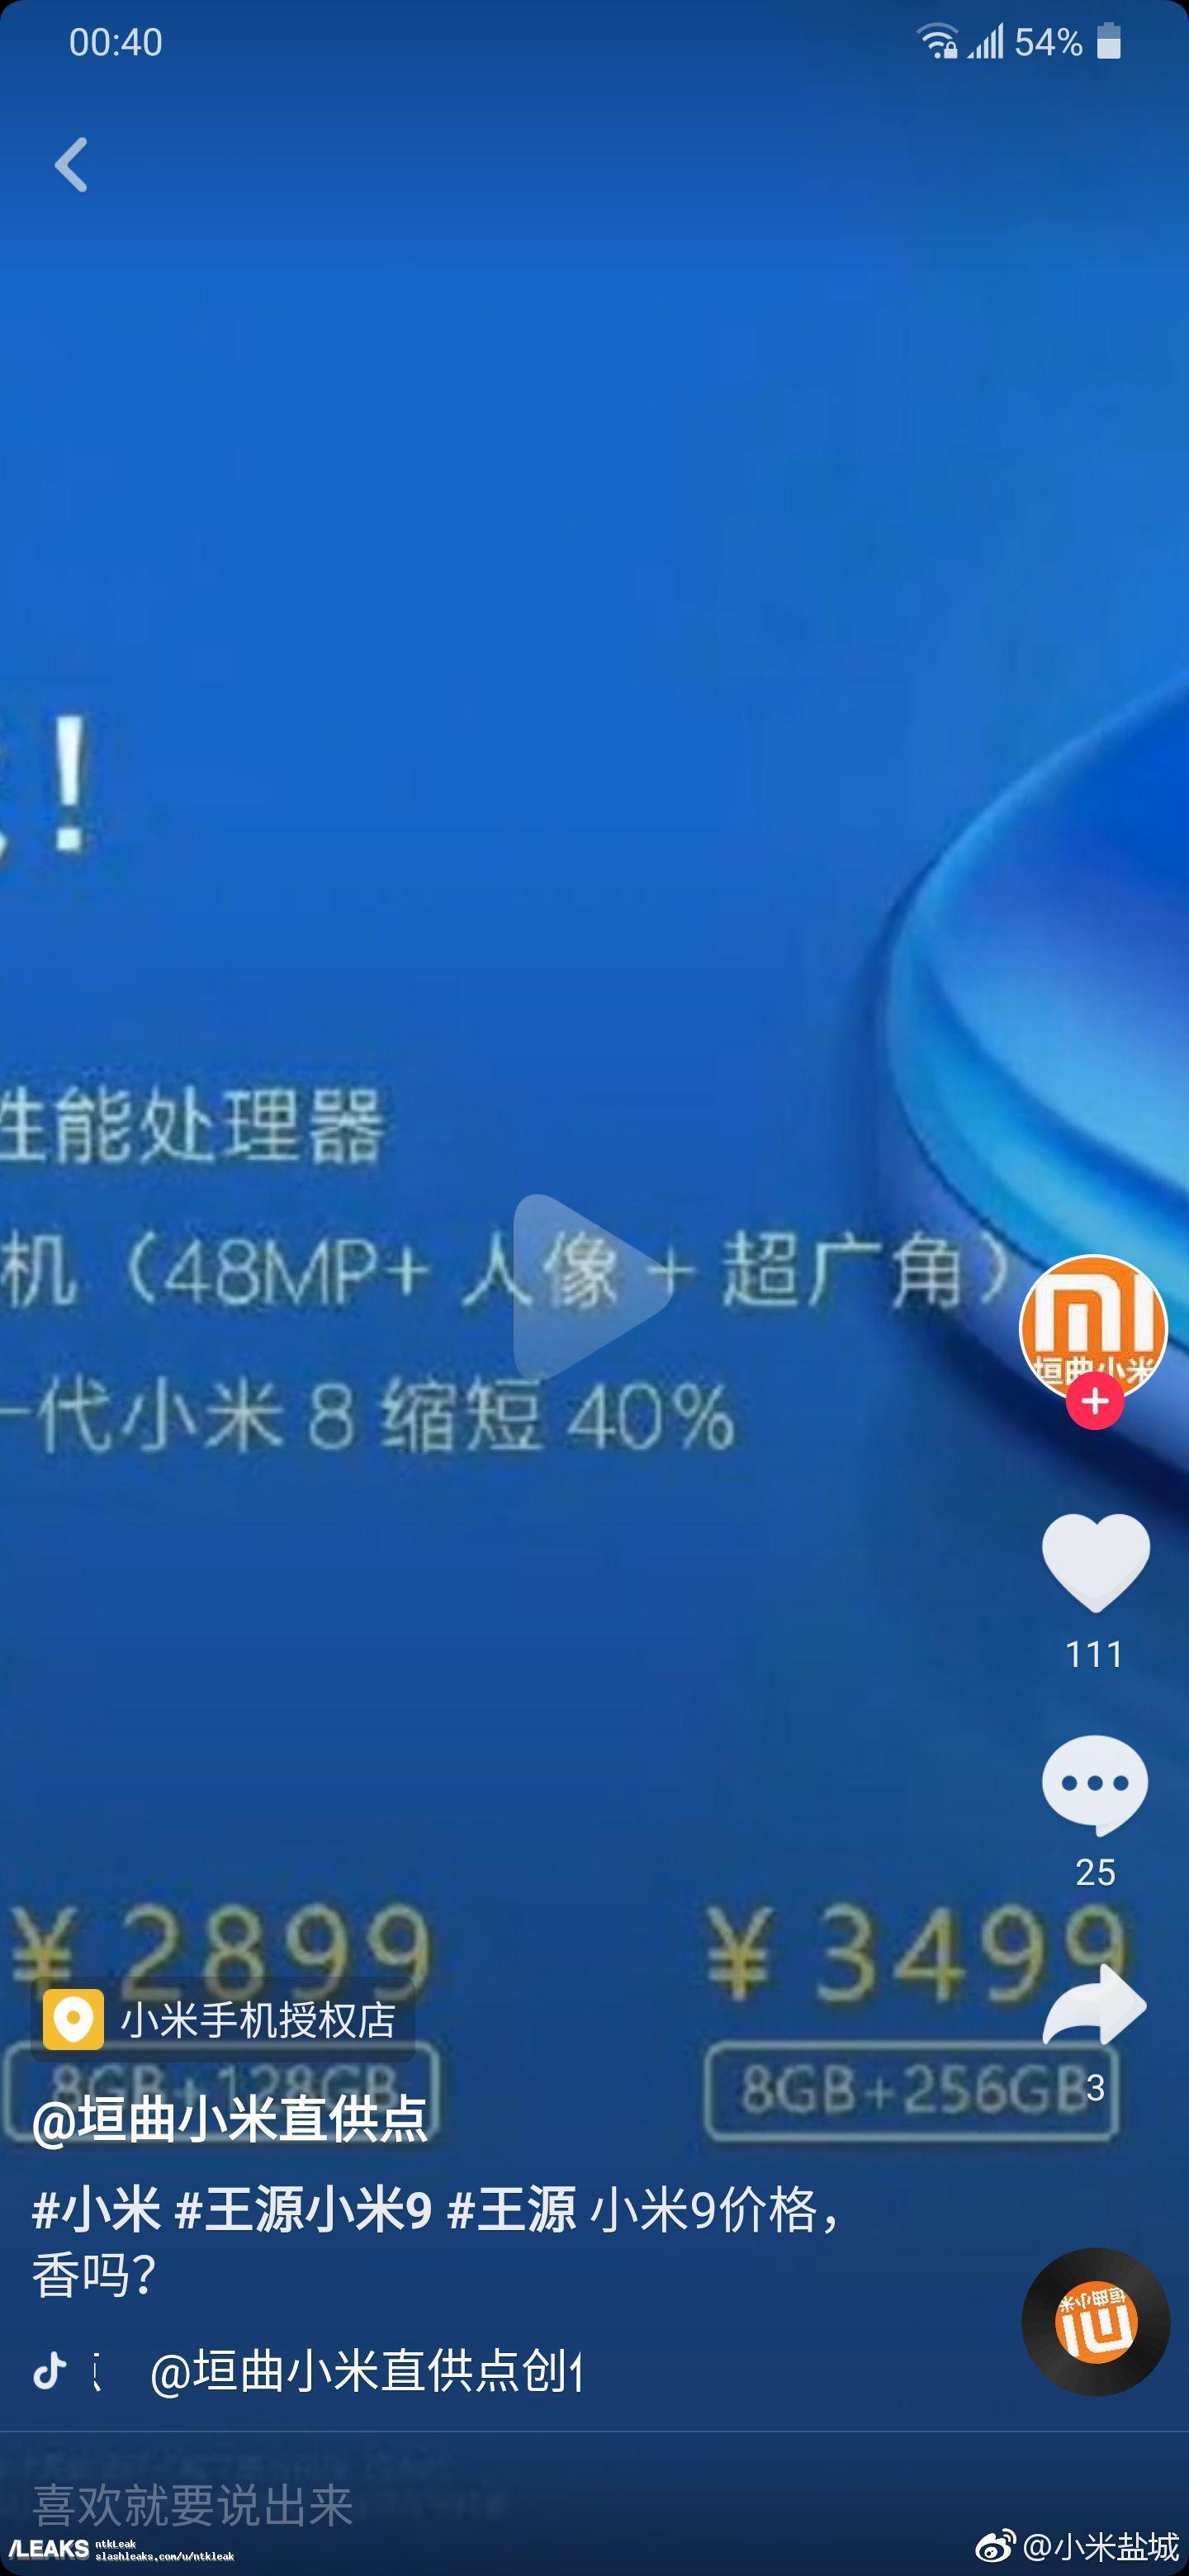 img Xiaomi Mi 9 (Standard) spec and price leak again, 2499 yuan for min RAM/ROM, 3499 yuan for max RAM/ROM